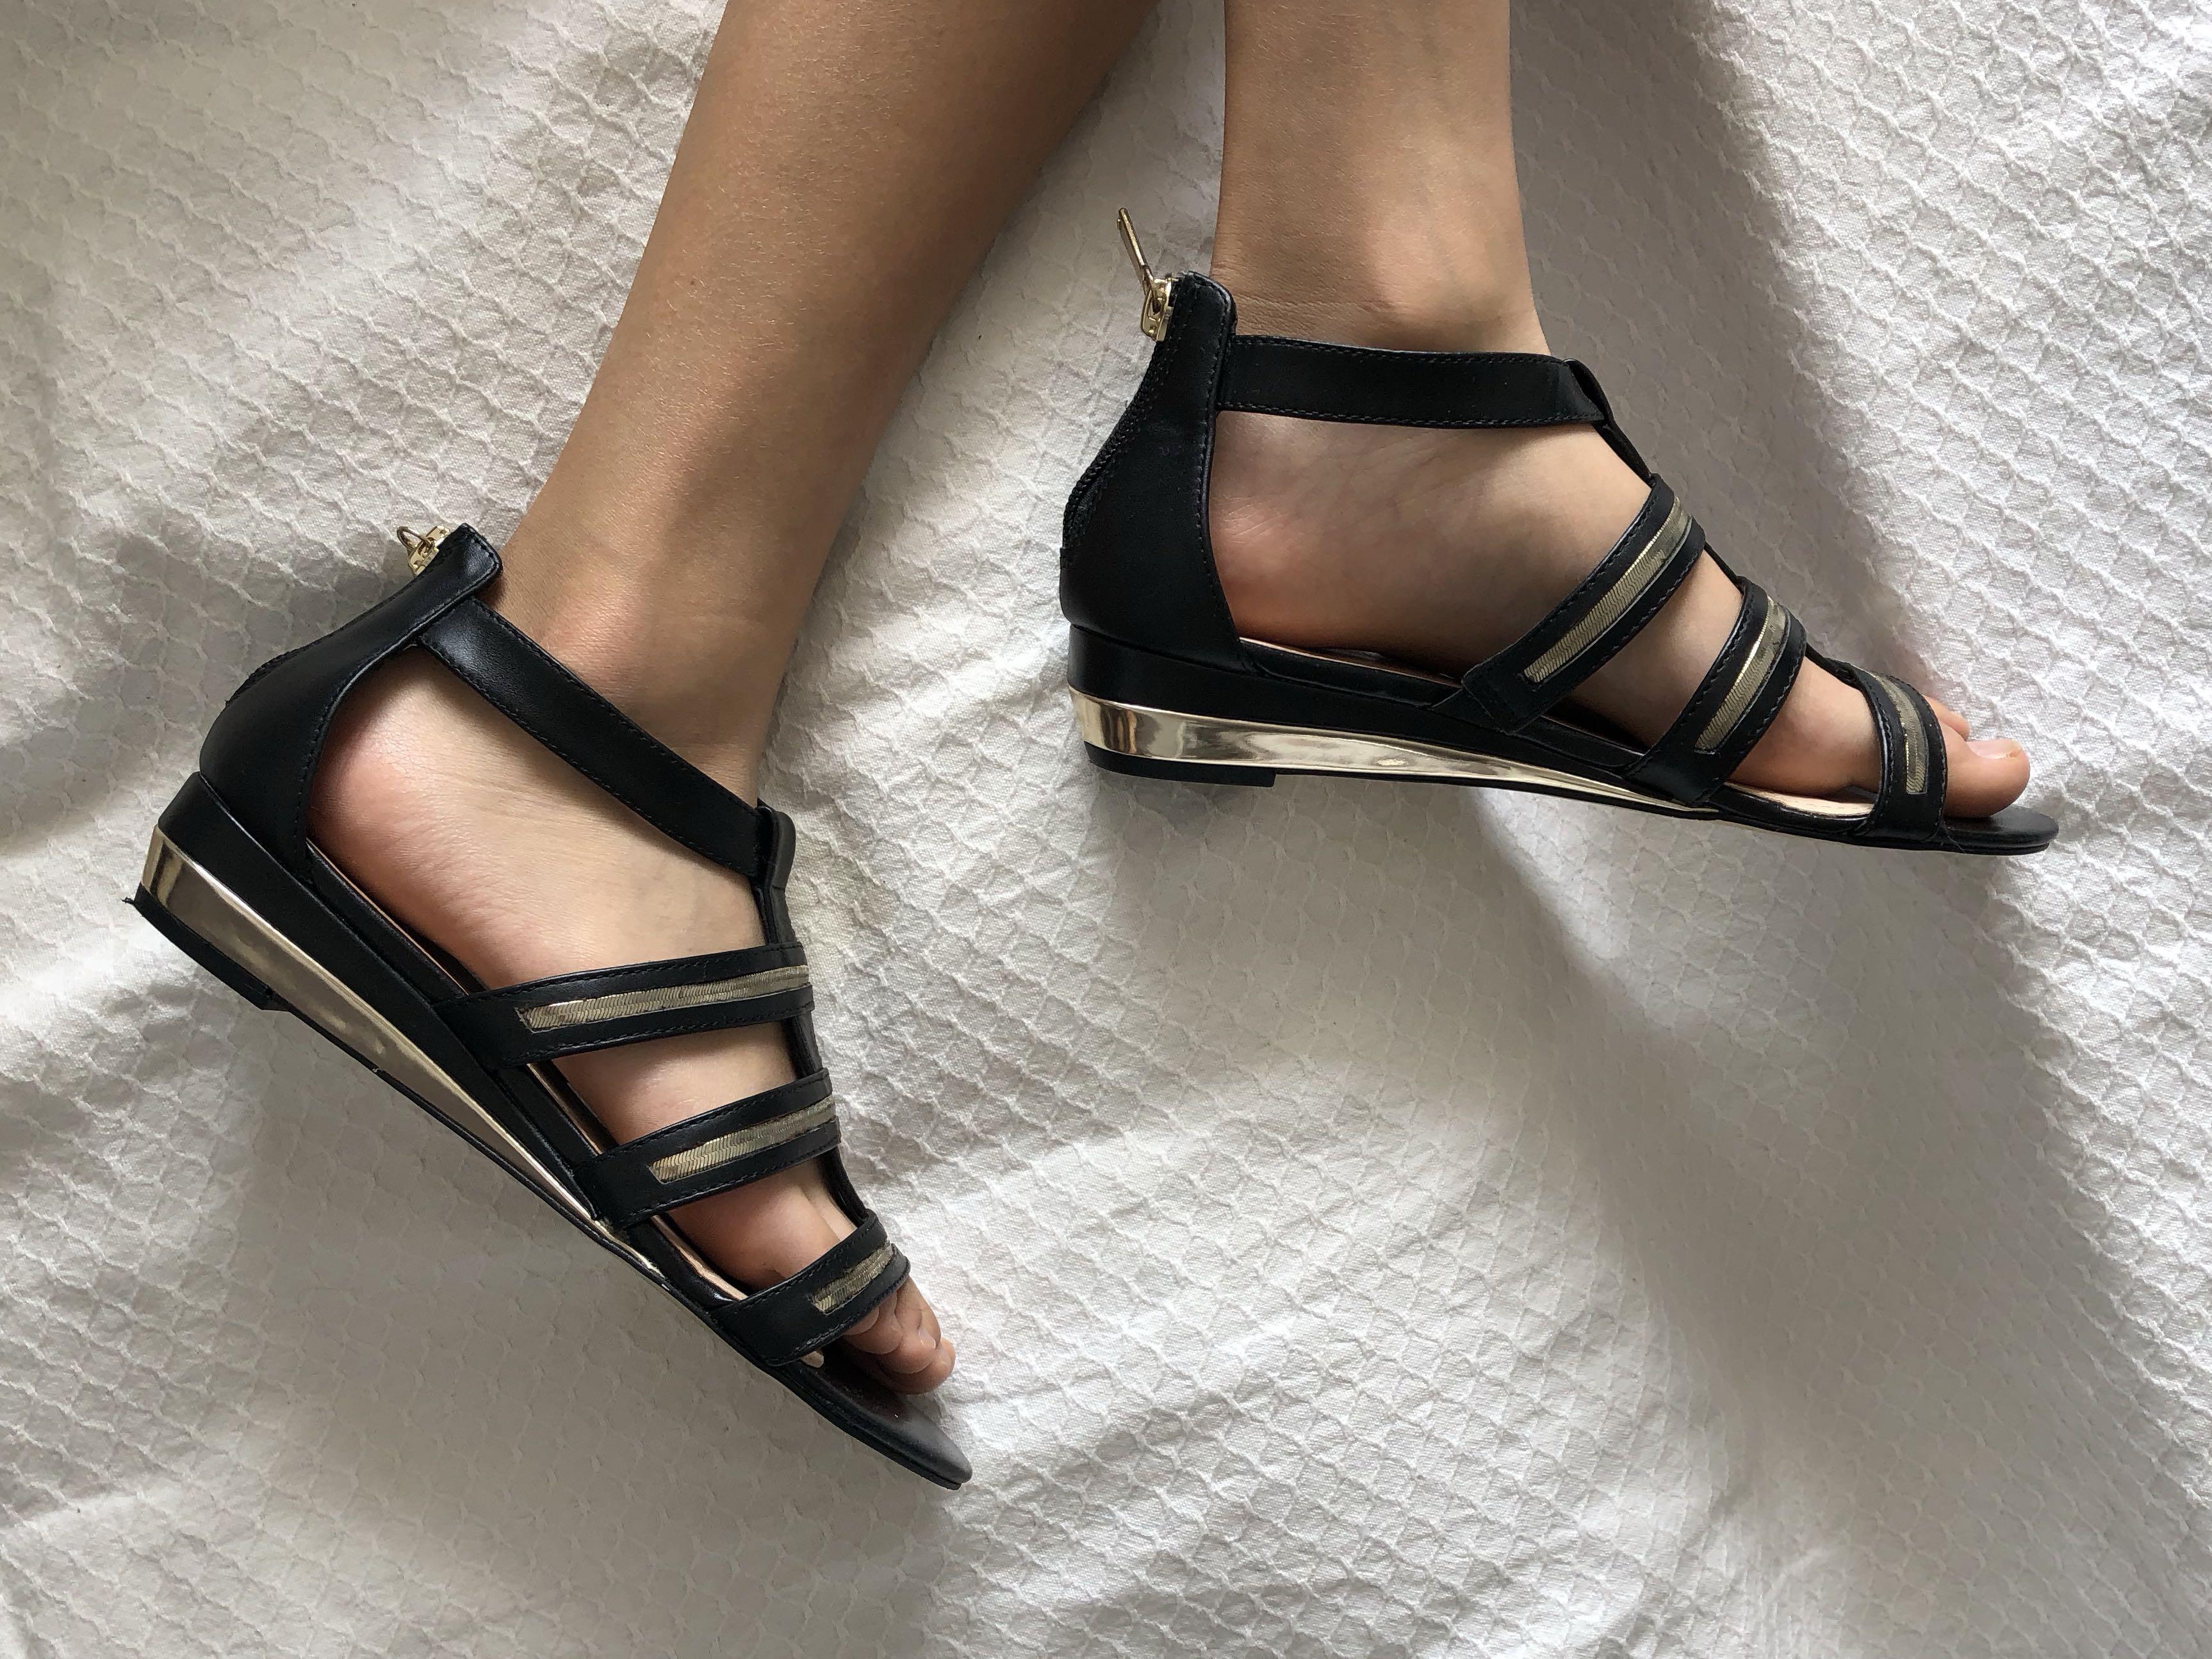 Black slightly heeled sandals with gold detailing